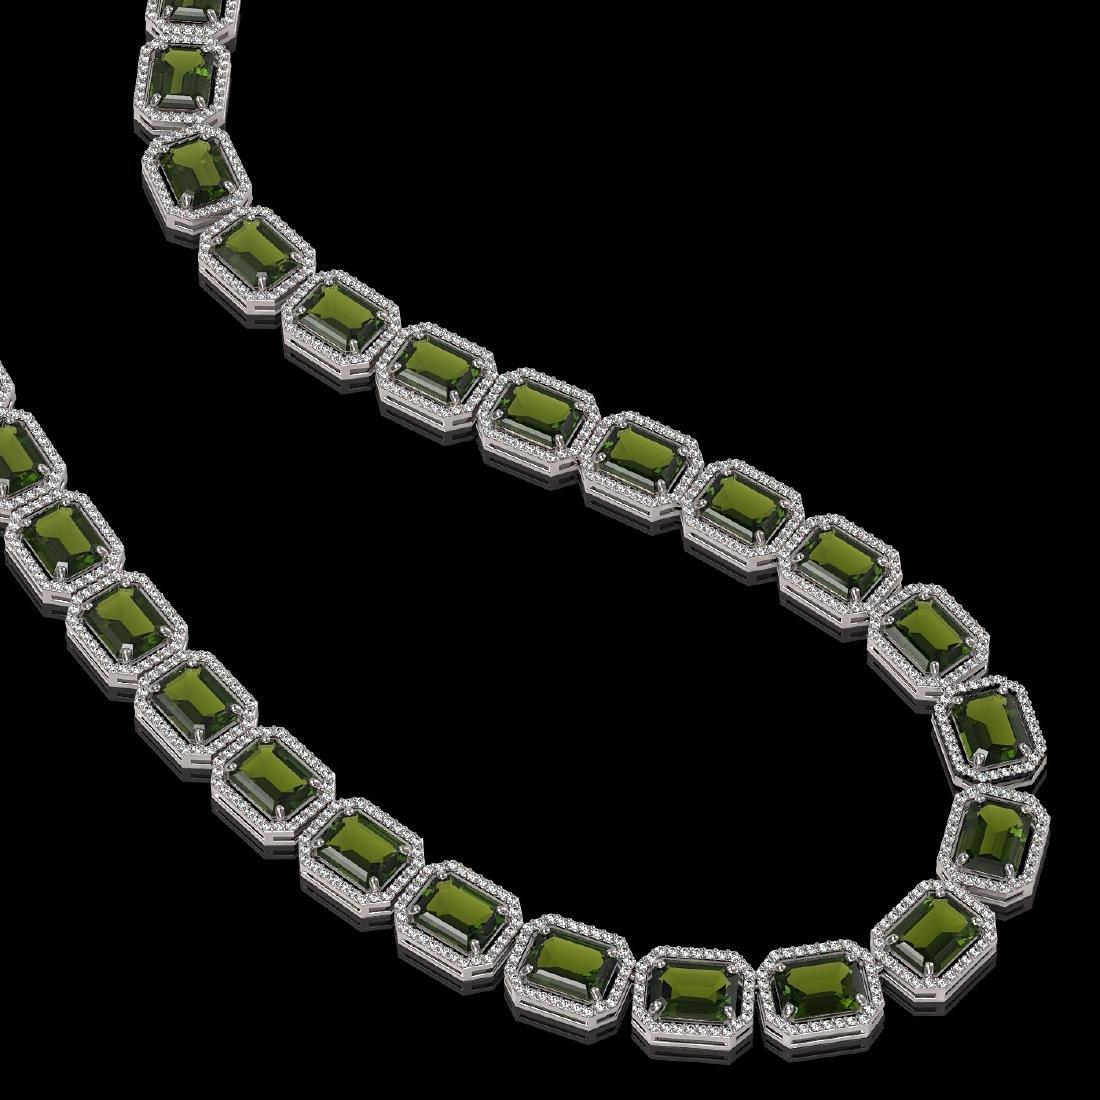 80.65 CTW Tourmaline & Diamond Halo Necklace 10K White - 2